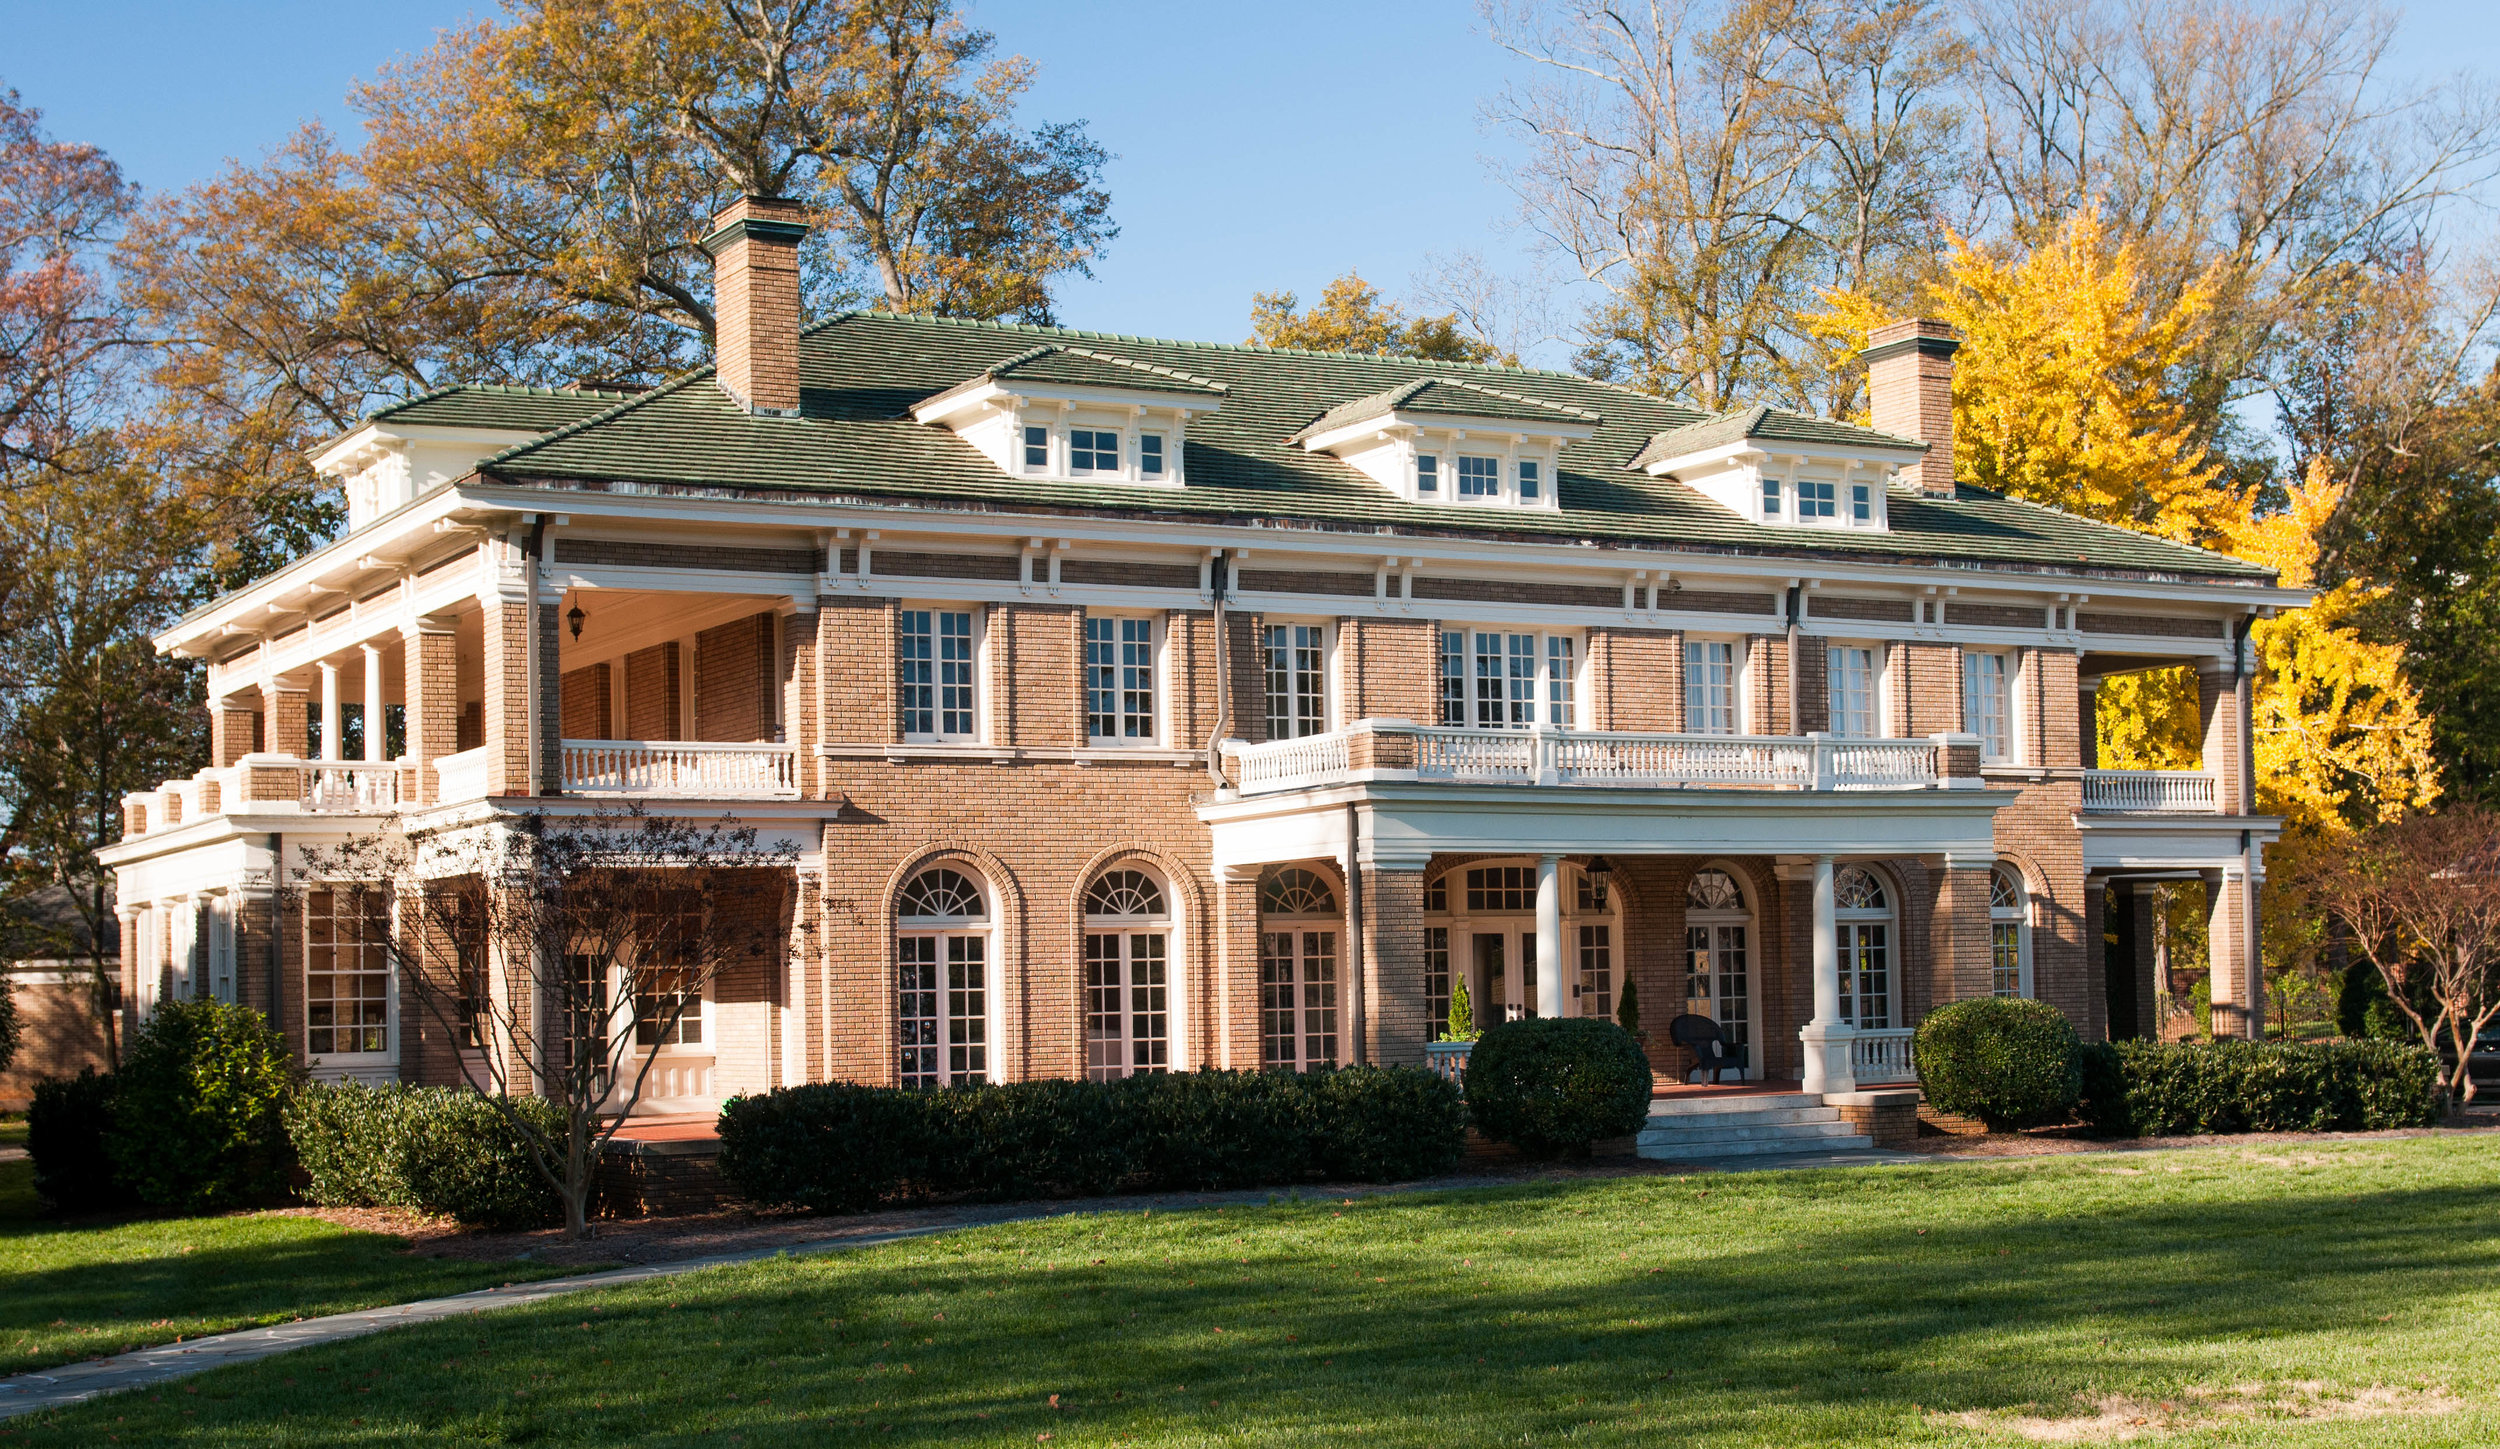 A.C. Lineberger House, Cir. 1921